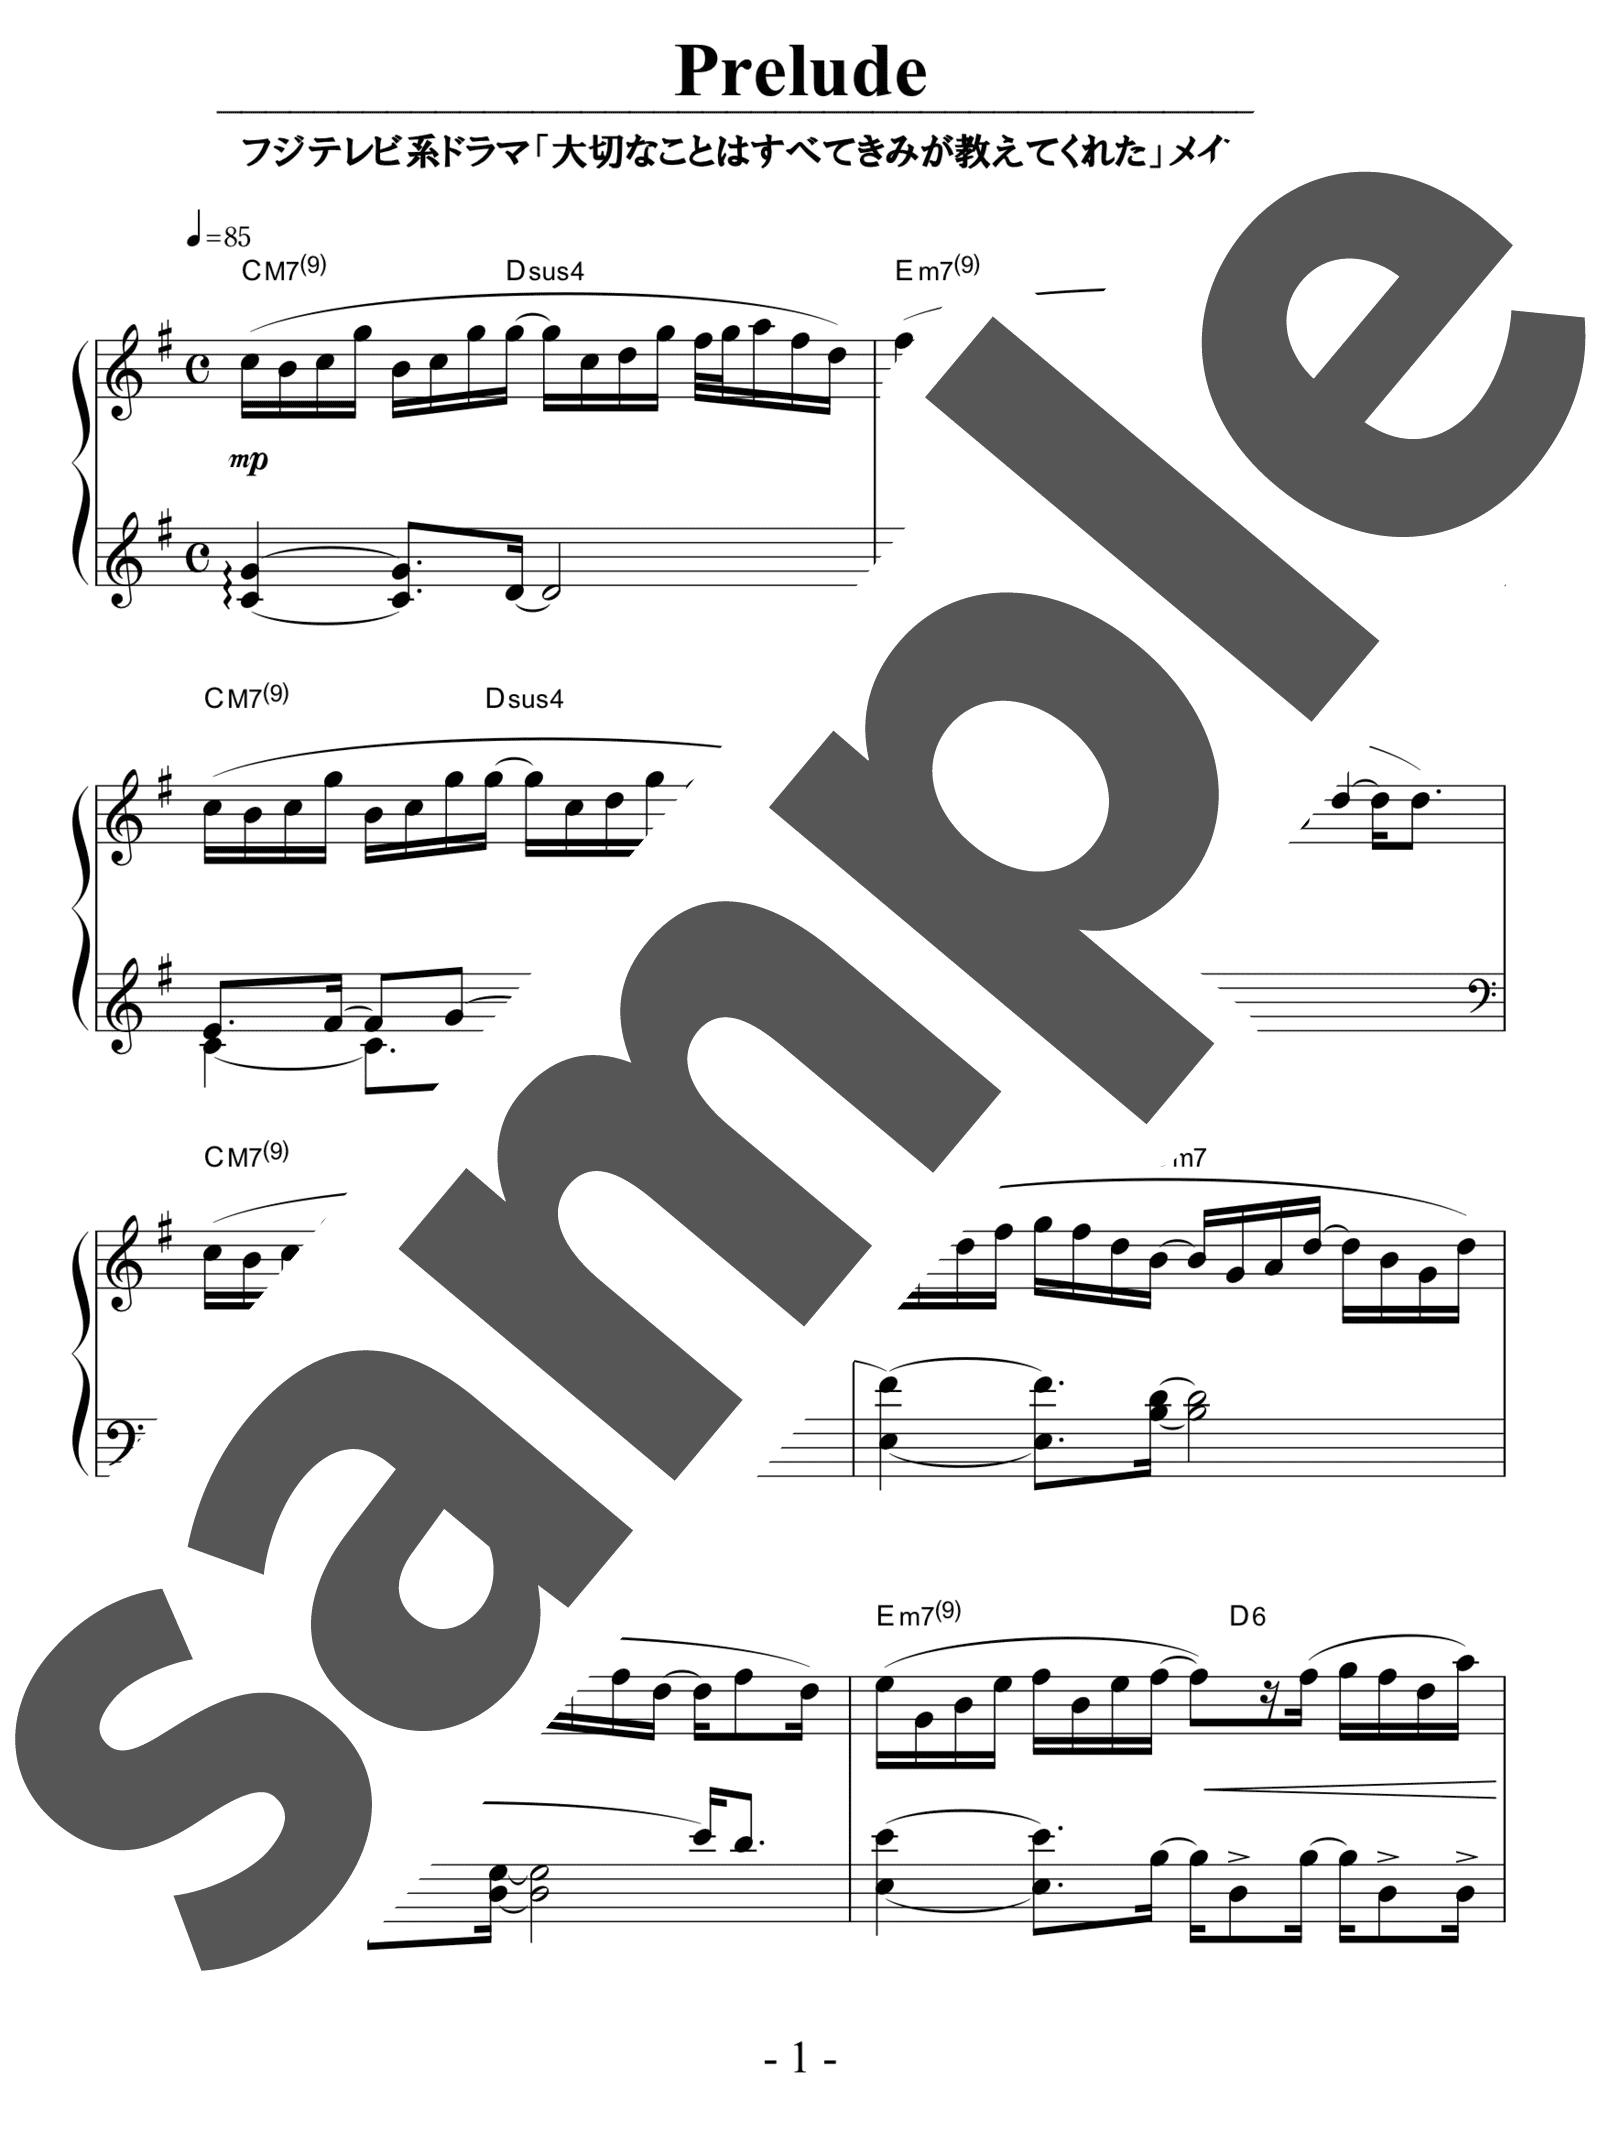 「Prelude」のサンプル楽譜